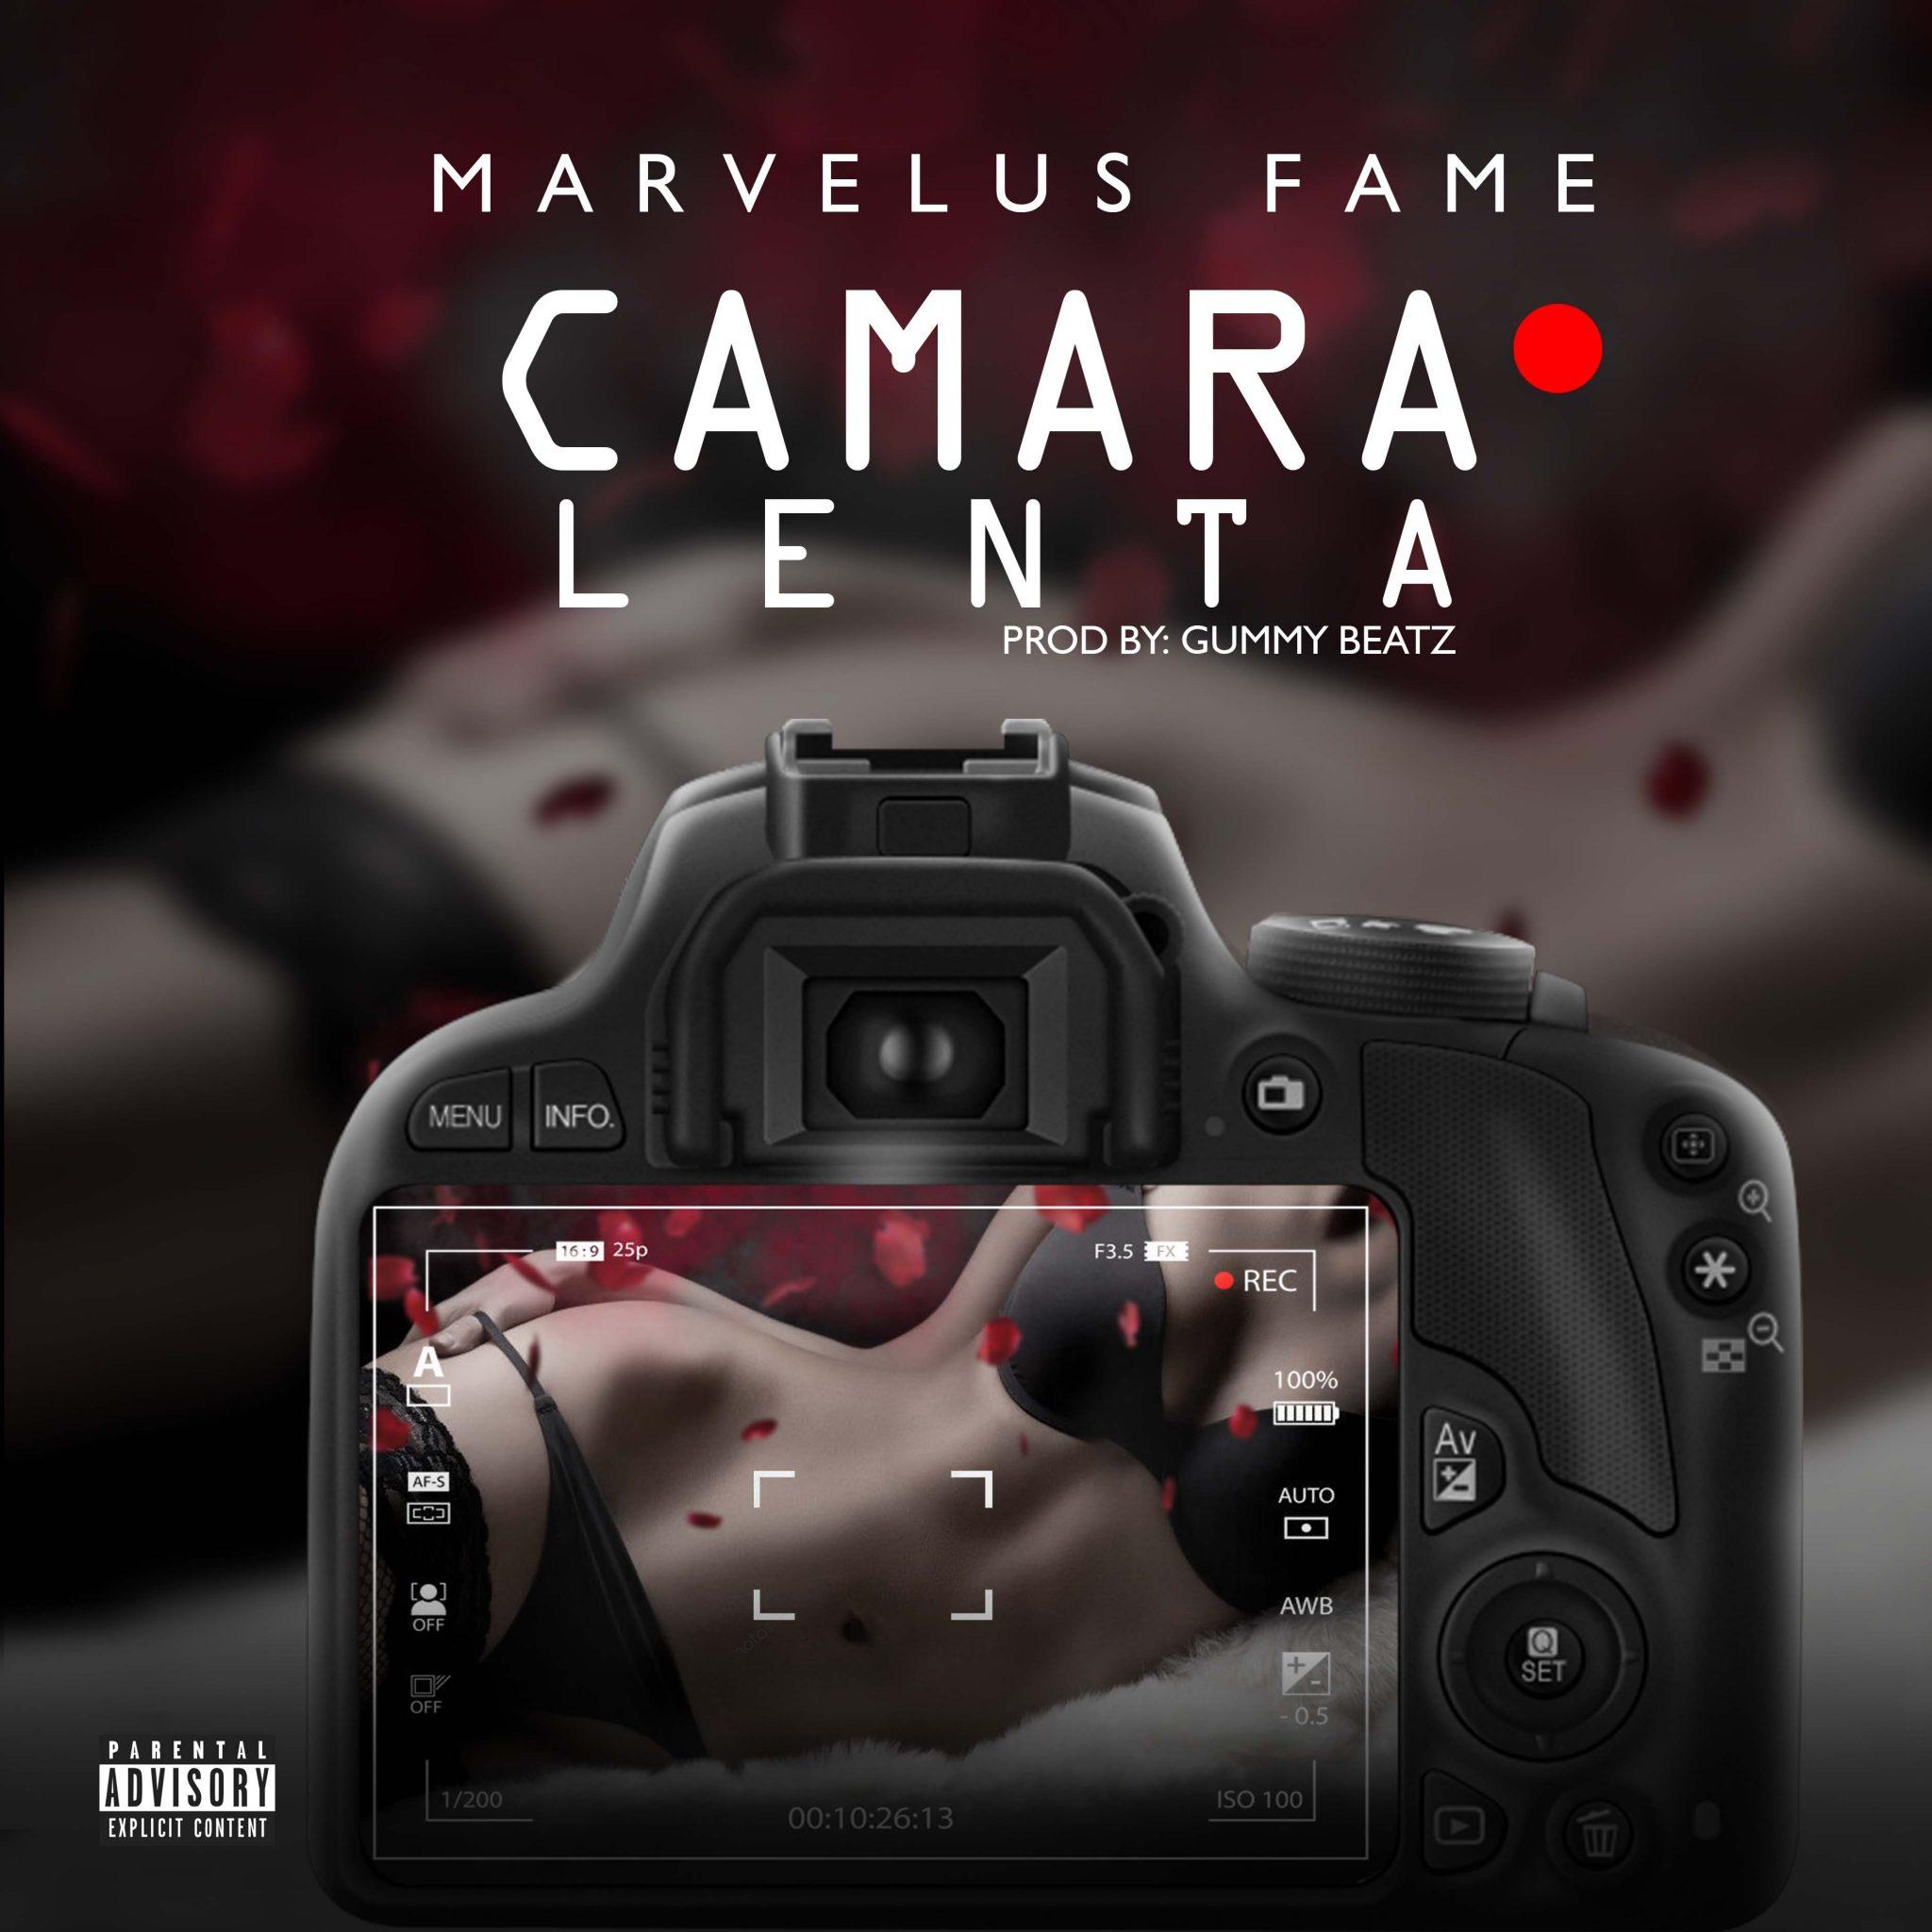 Marvelus Fame Camara Lenta - Marvelus Fame - Camara Lenta